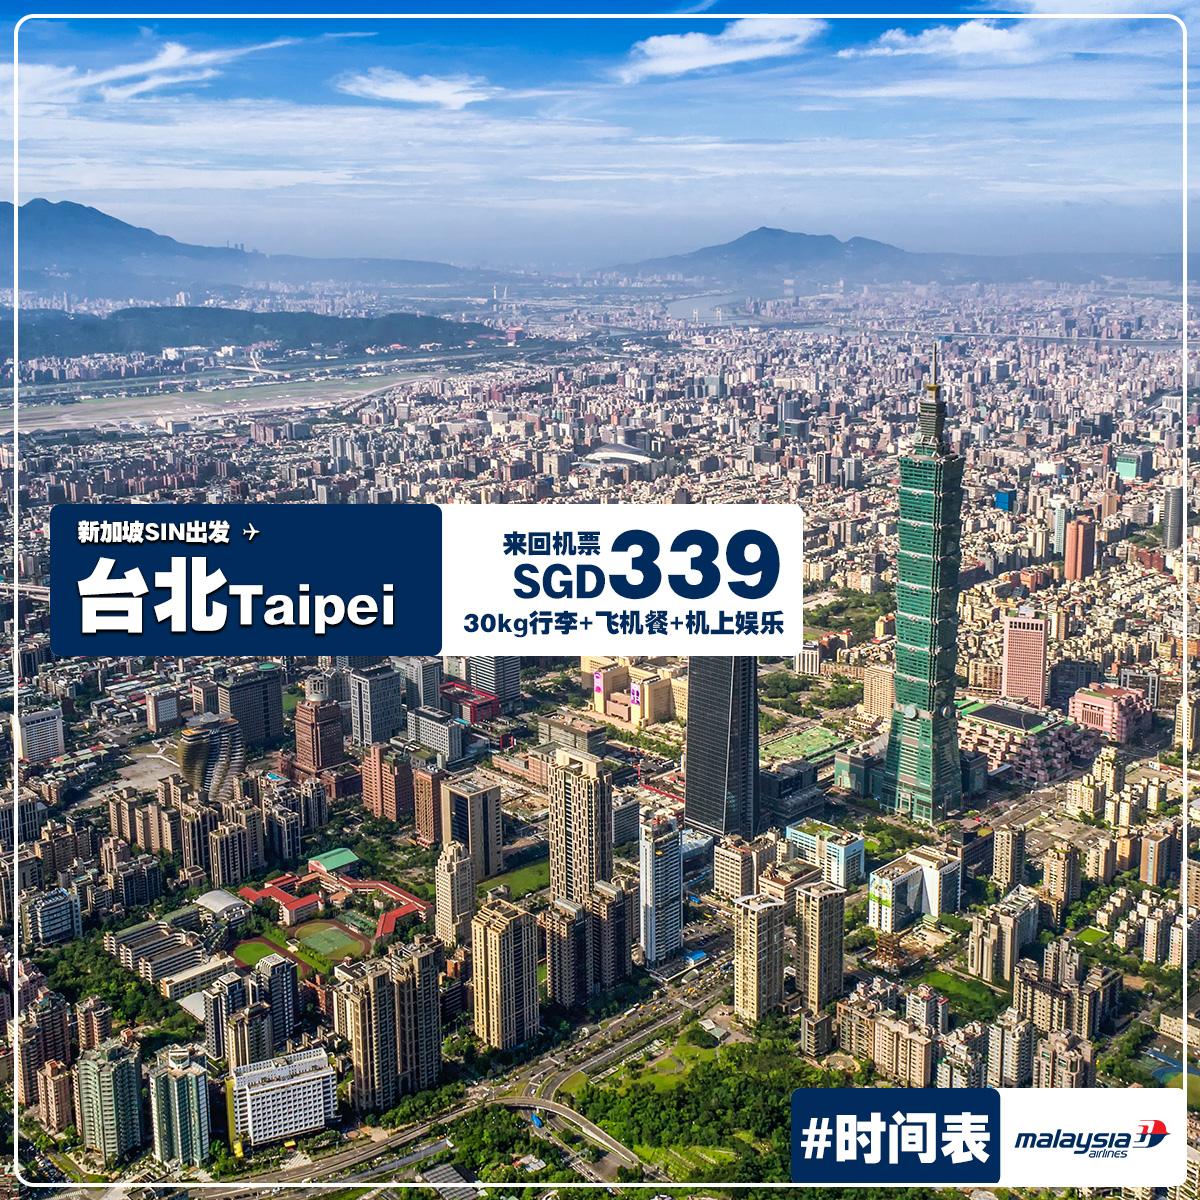 Photo of 【台湾Taiwan优惠】新加坡SIN — 台北Taipei 包括30kg行李+飞机餐!来回SGD339!![Exp: 24 Feb 2019]